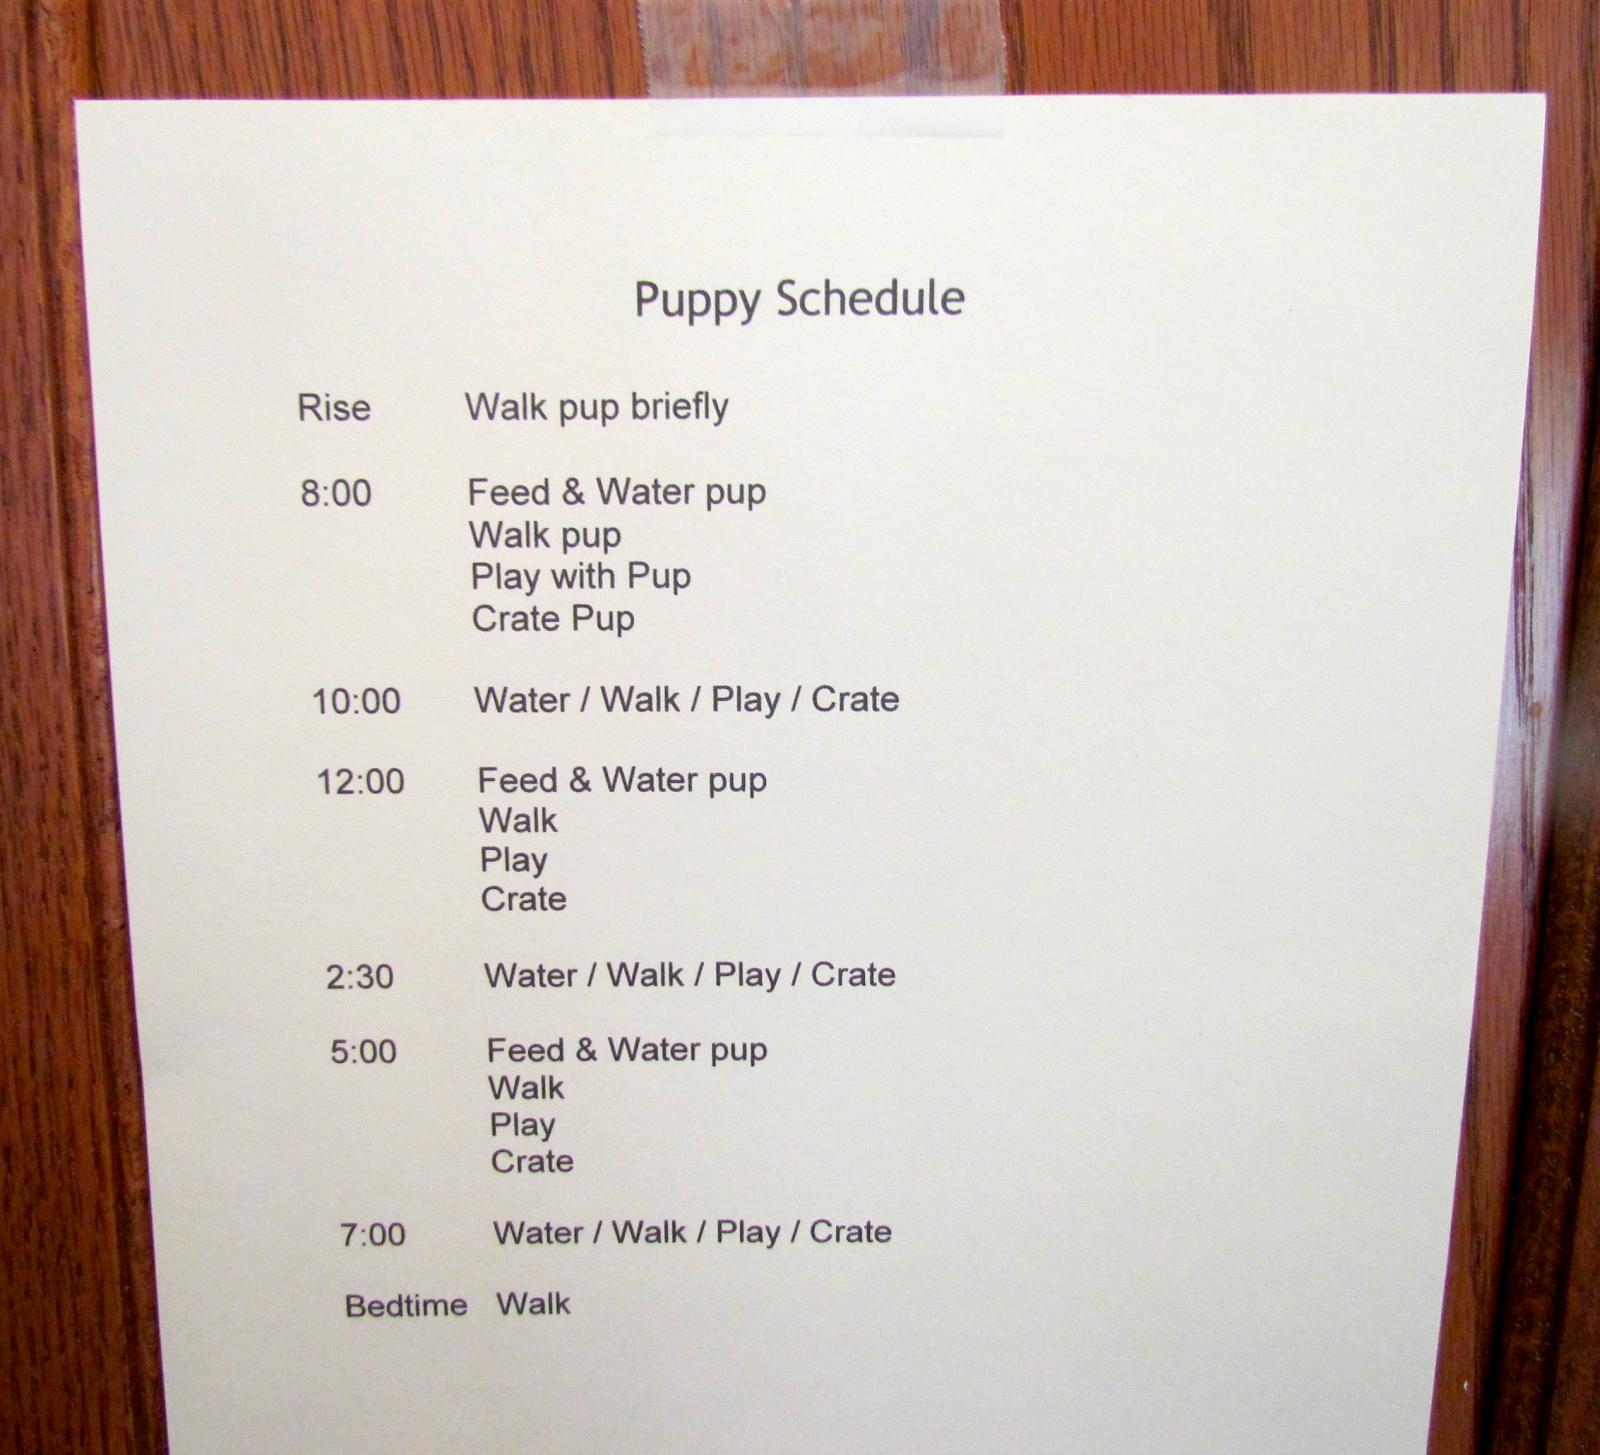 Outdoor Potty Schedules 15 Week Puppy Update Crate Training